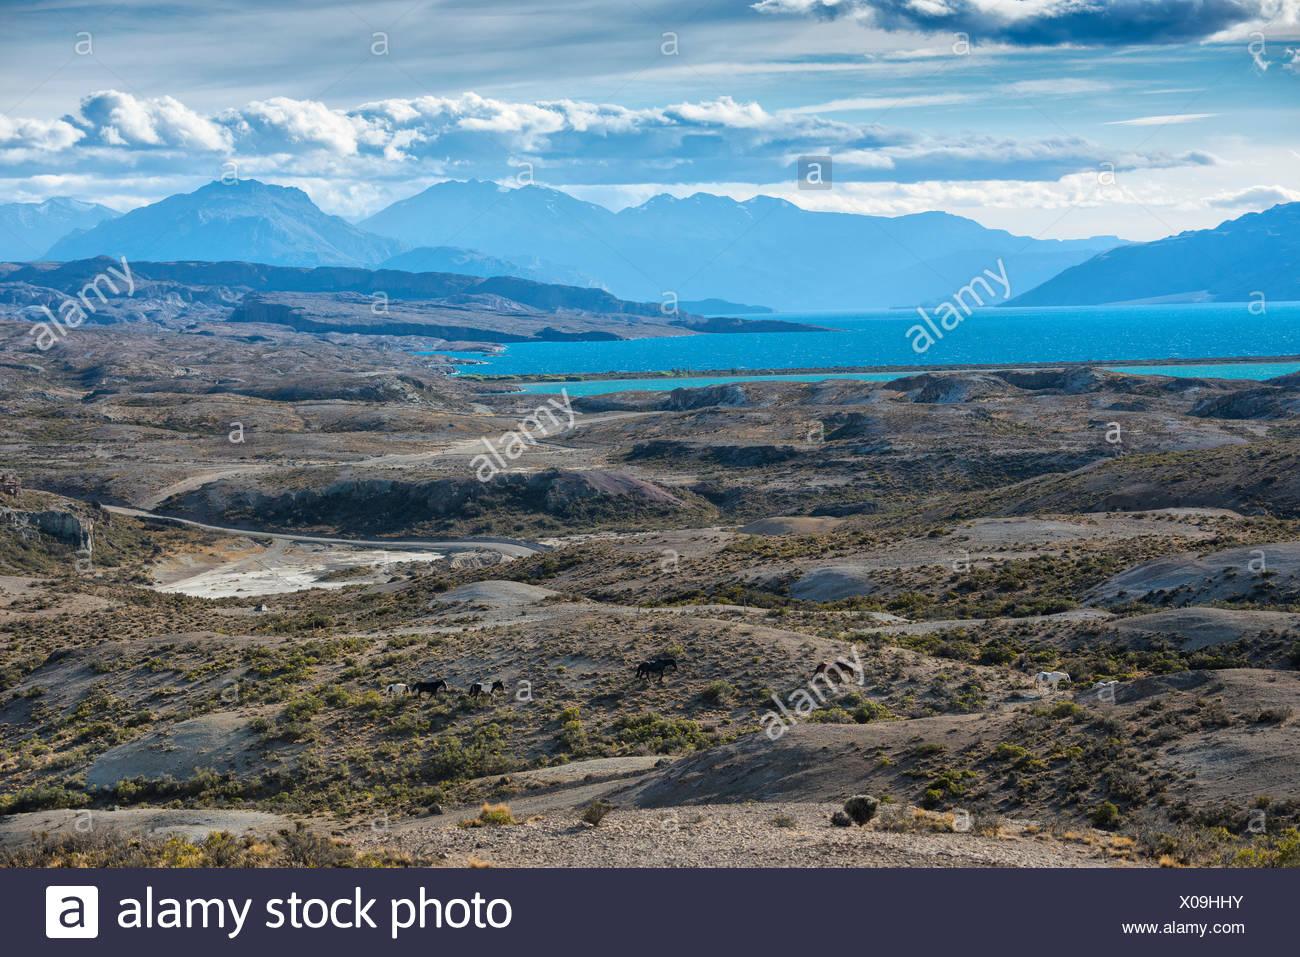 South America,Argentina,Santa Cruz,Patagonia,Lago Posadas,Lago Pueyrredon - Stock Image